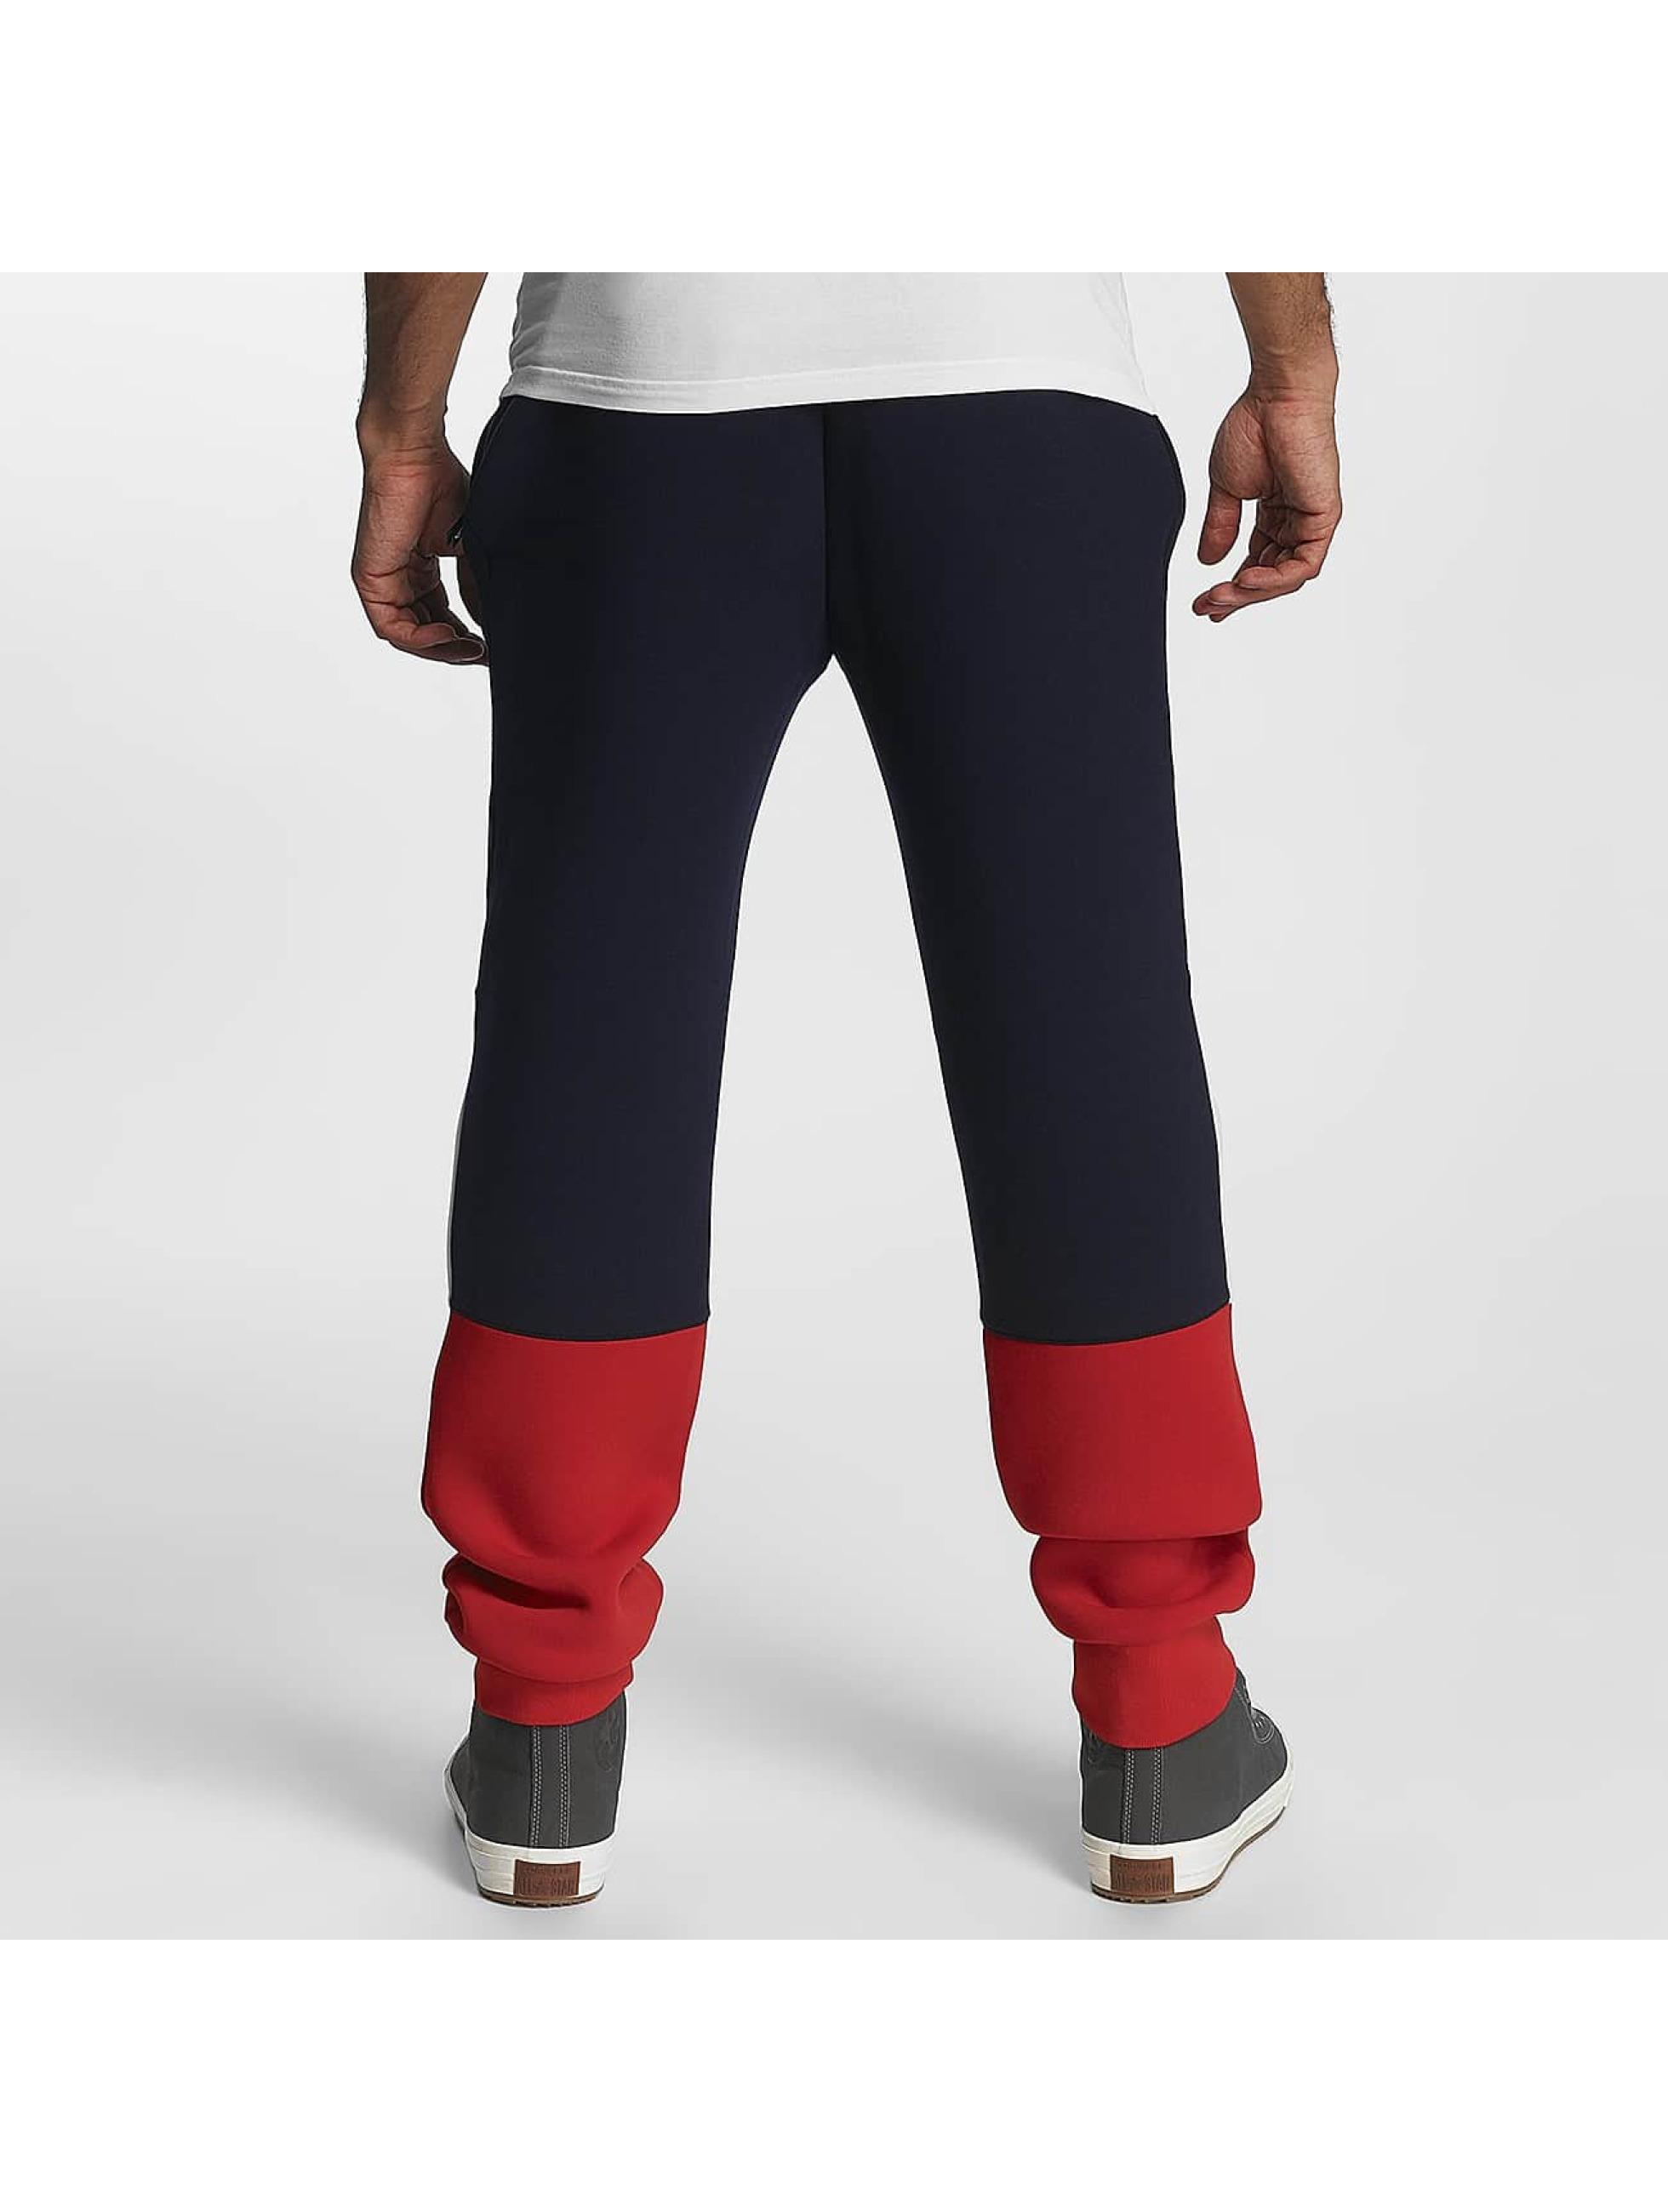 FILA Sweat Pant Black Line Jude blue